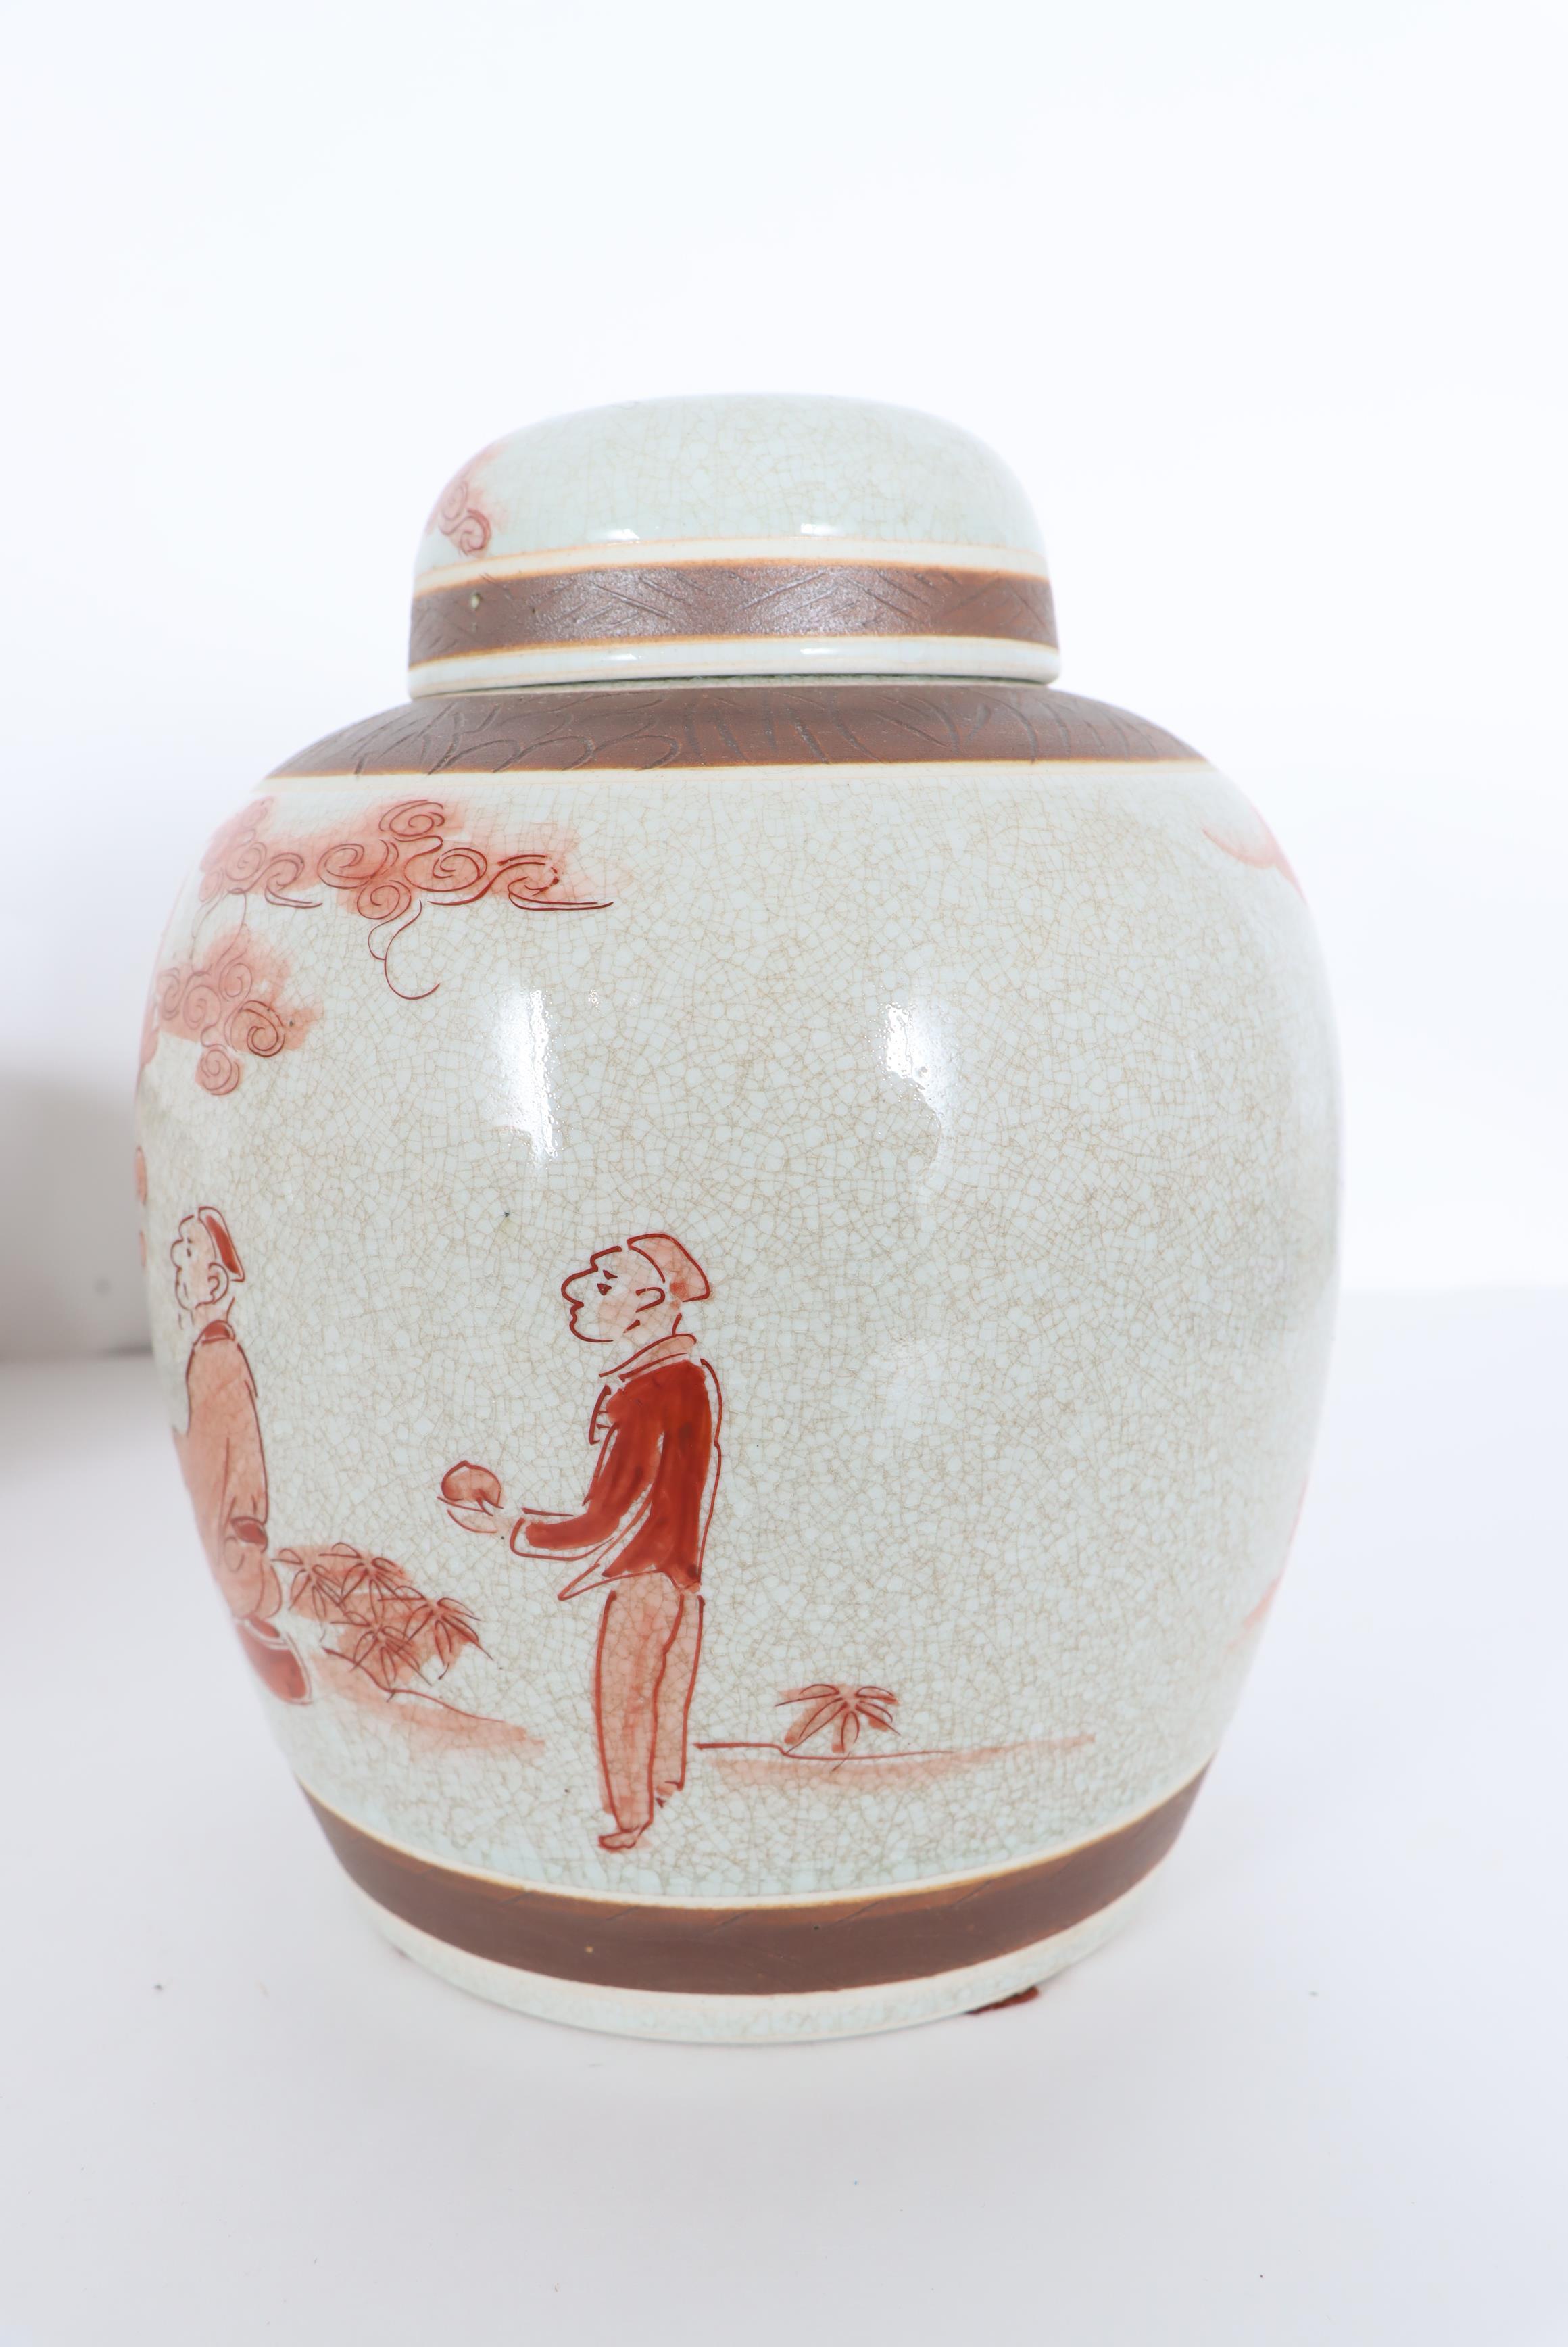 Chinese Porcelain Bowl & Ginger Jar w Lid - Image 7 of 16